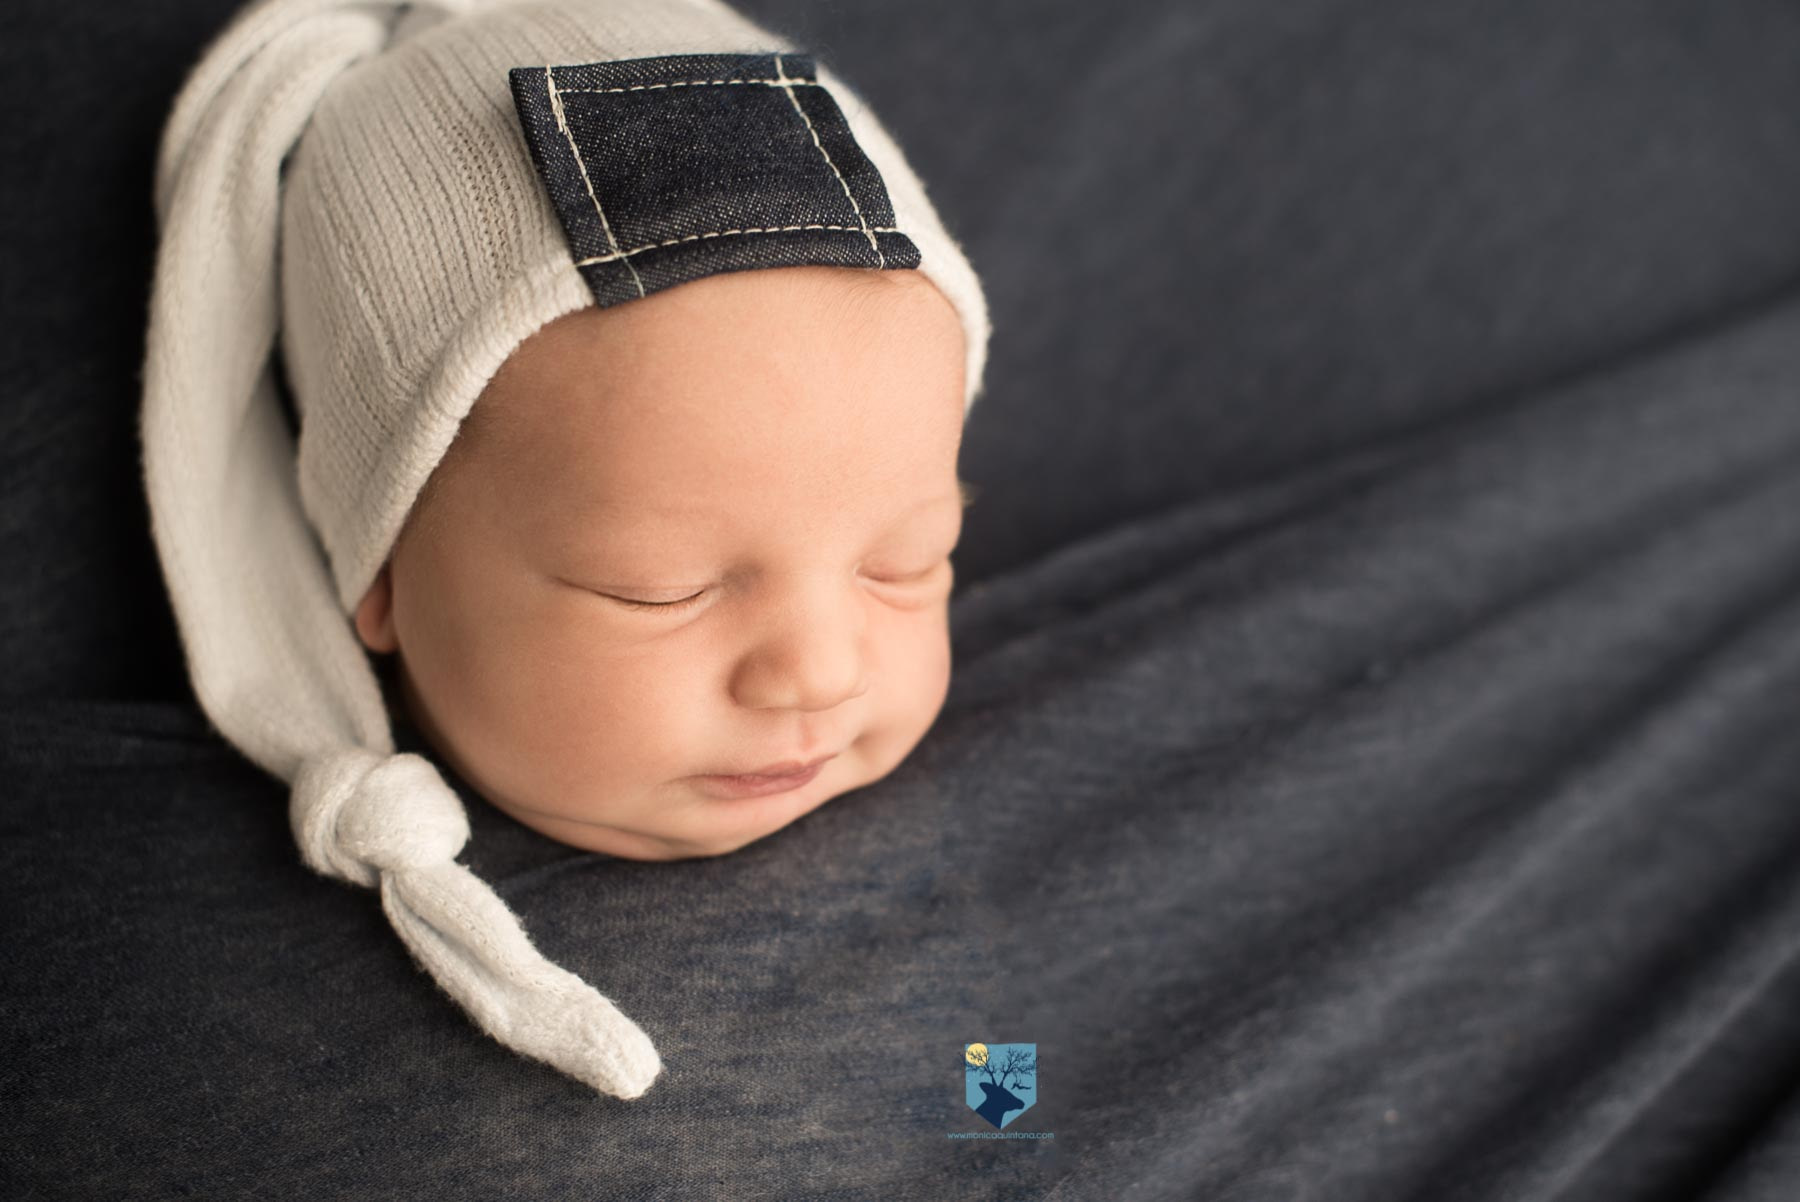 fotografia,fotos,girona,figueres,olot, roses, empuriabrava, la bisbal, L'escala, emporda,monica quintana,bebes,niños,recien nacido,newborn,familia,retrato,